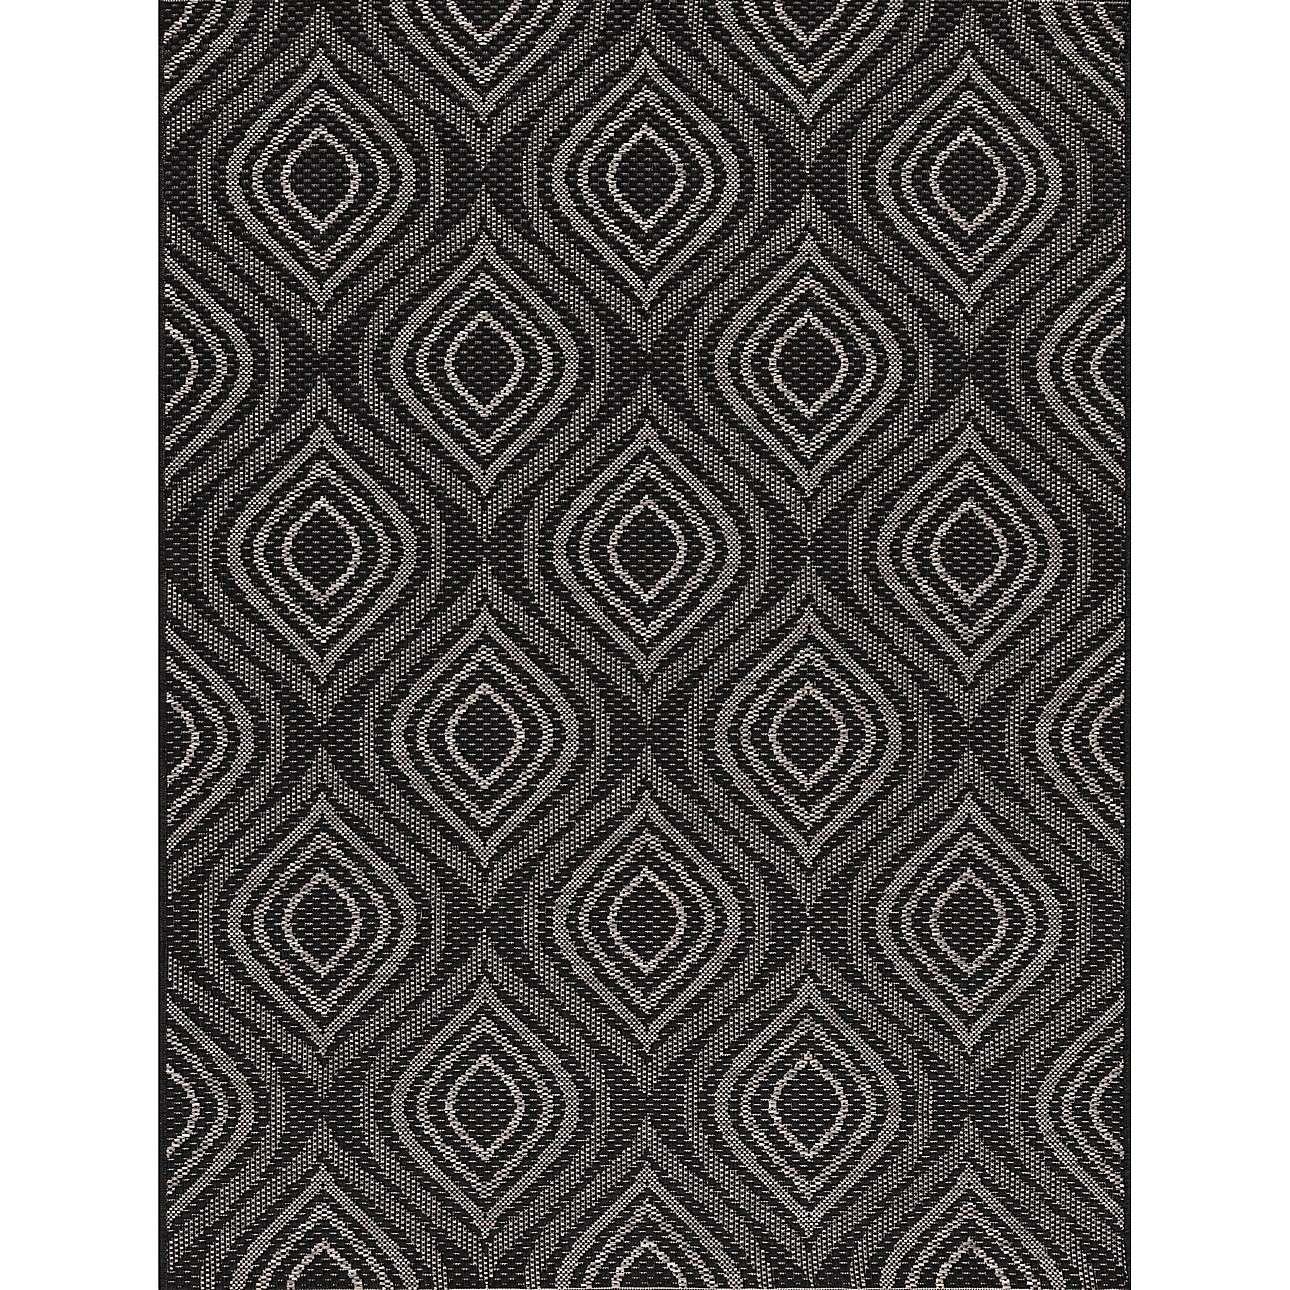 Koberec Breeze black/ clif grey 120 x 170 cm